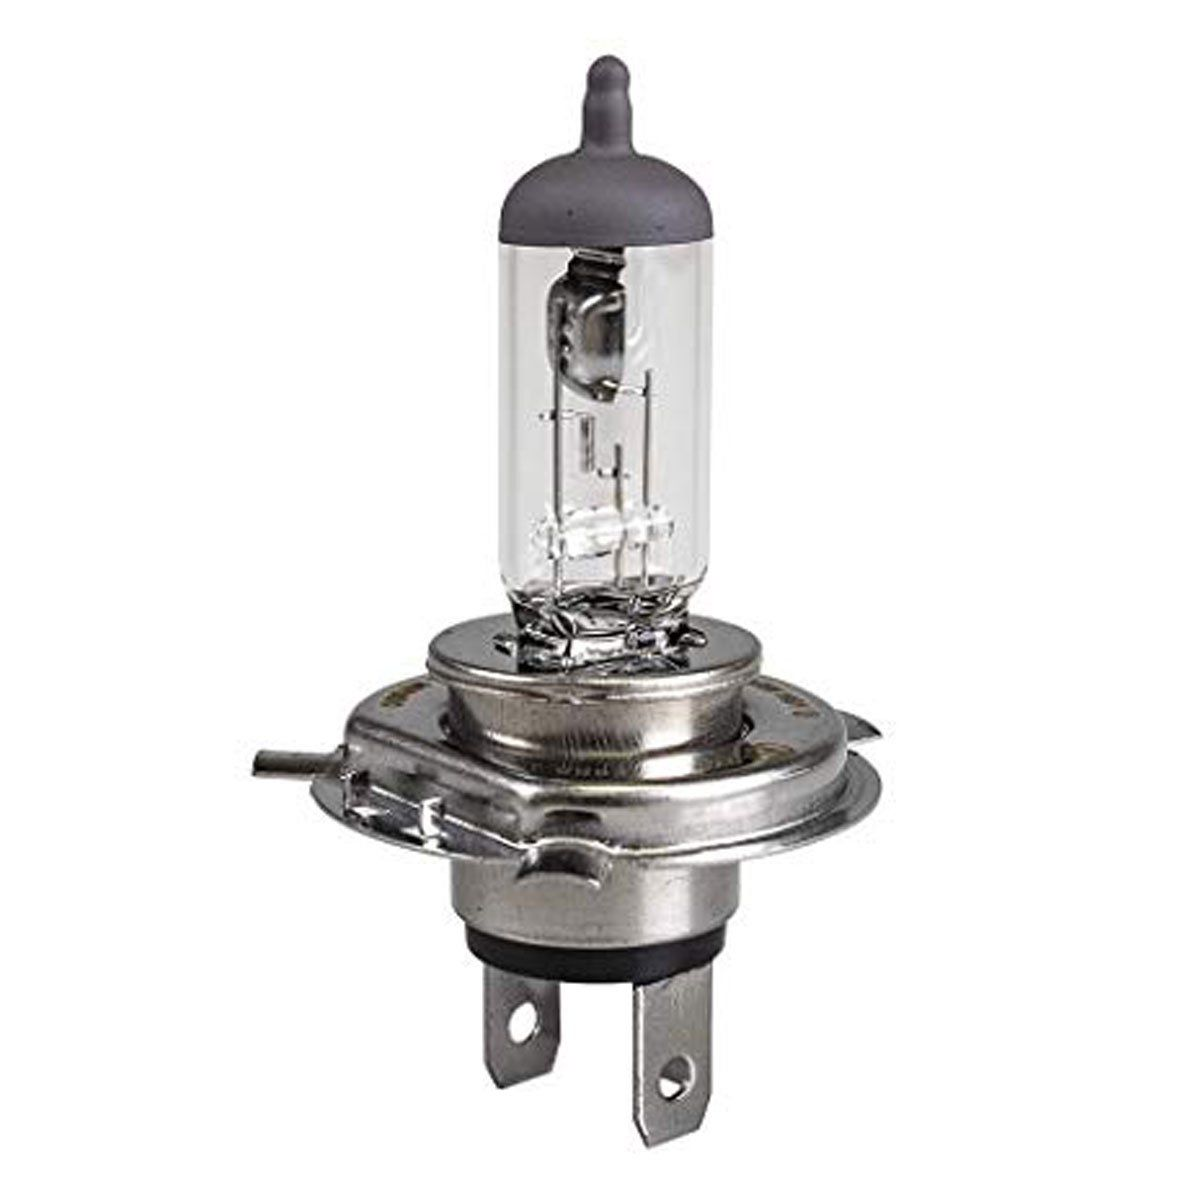 LAMPADA DE FAROL DIANTEIRO - OUTLANDER